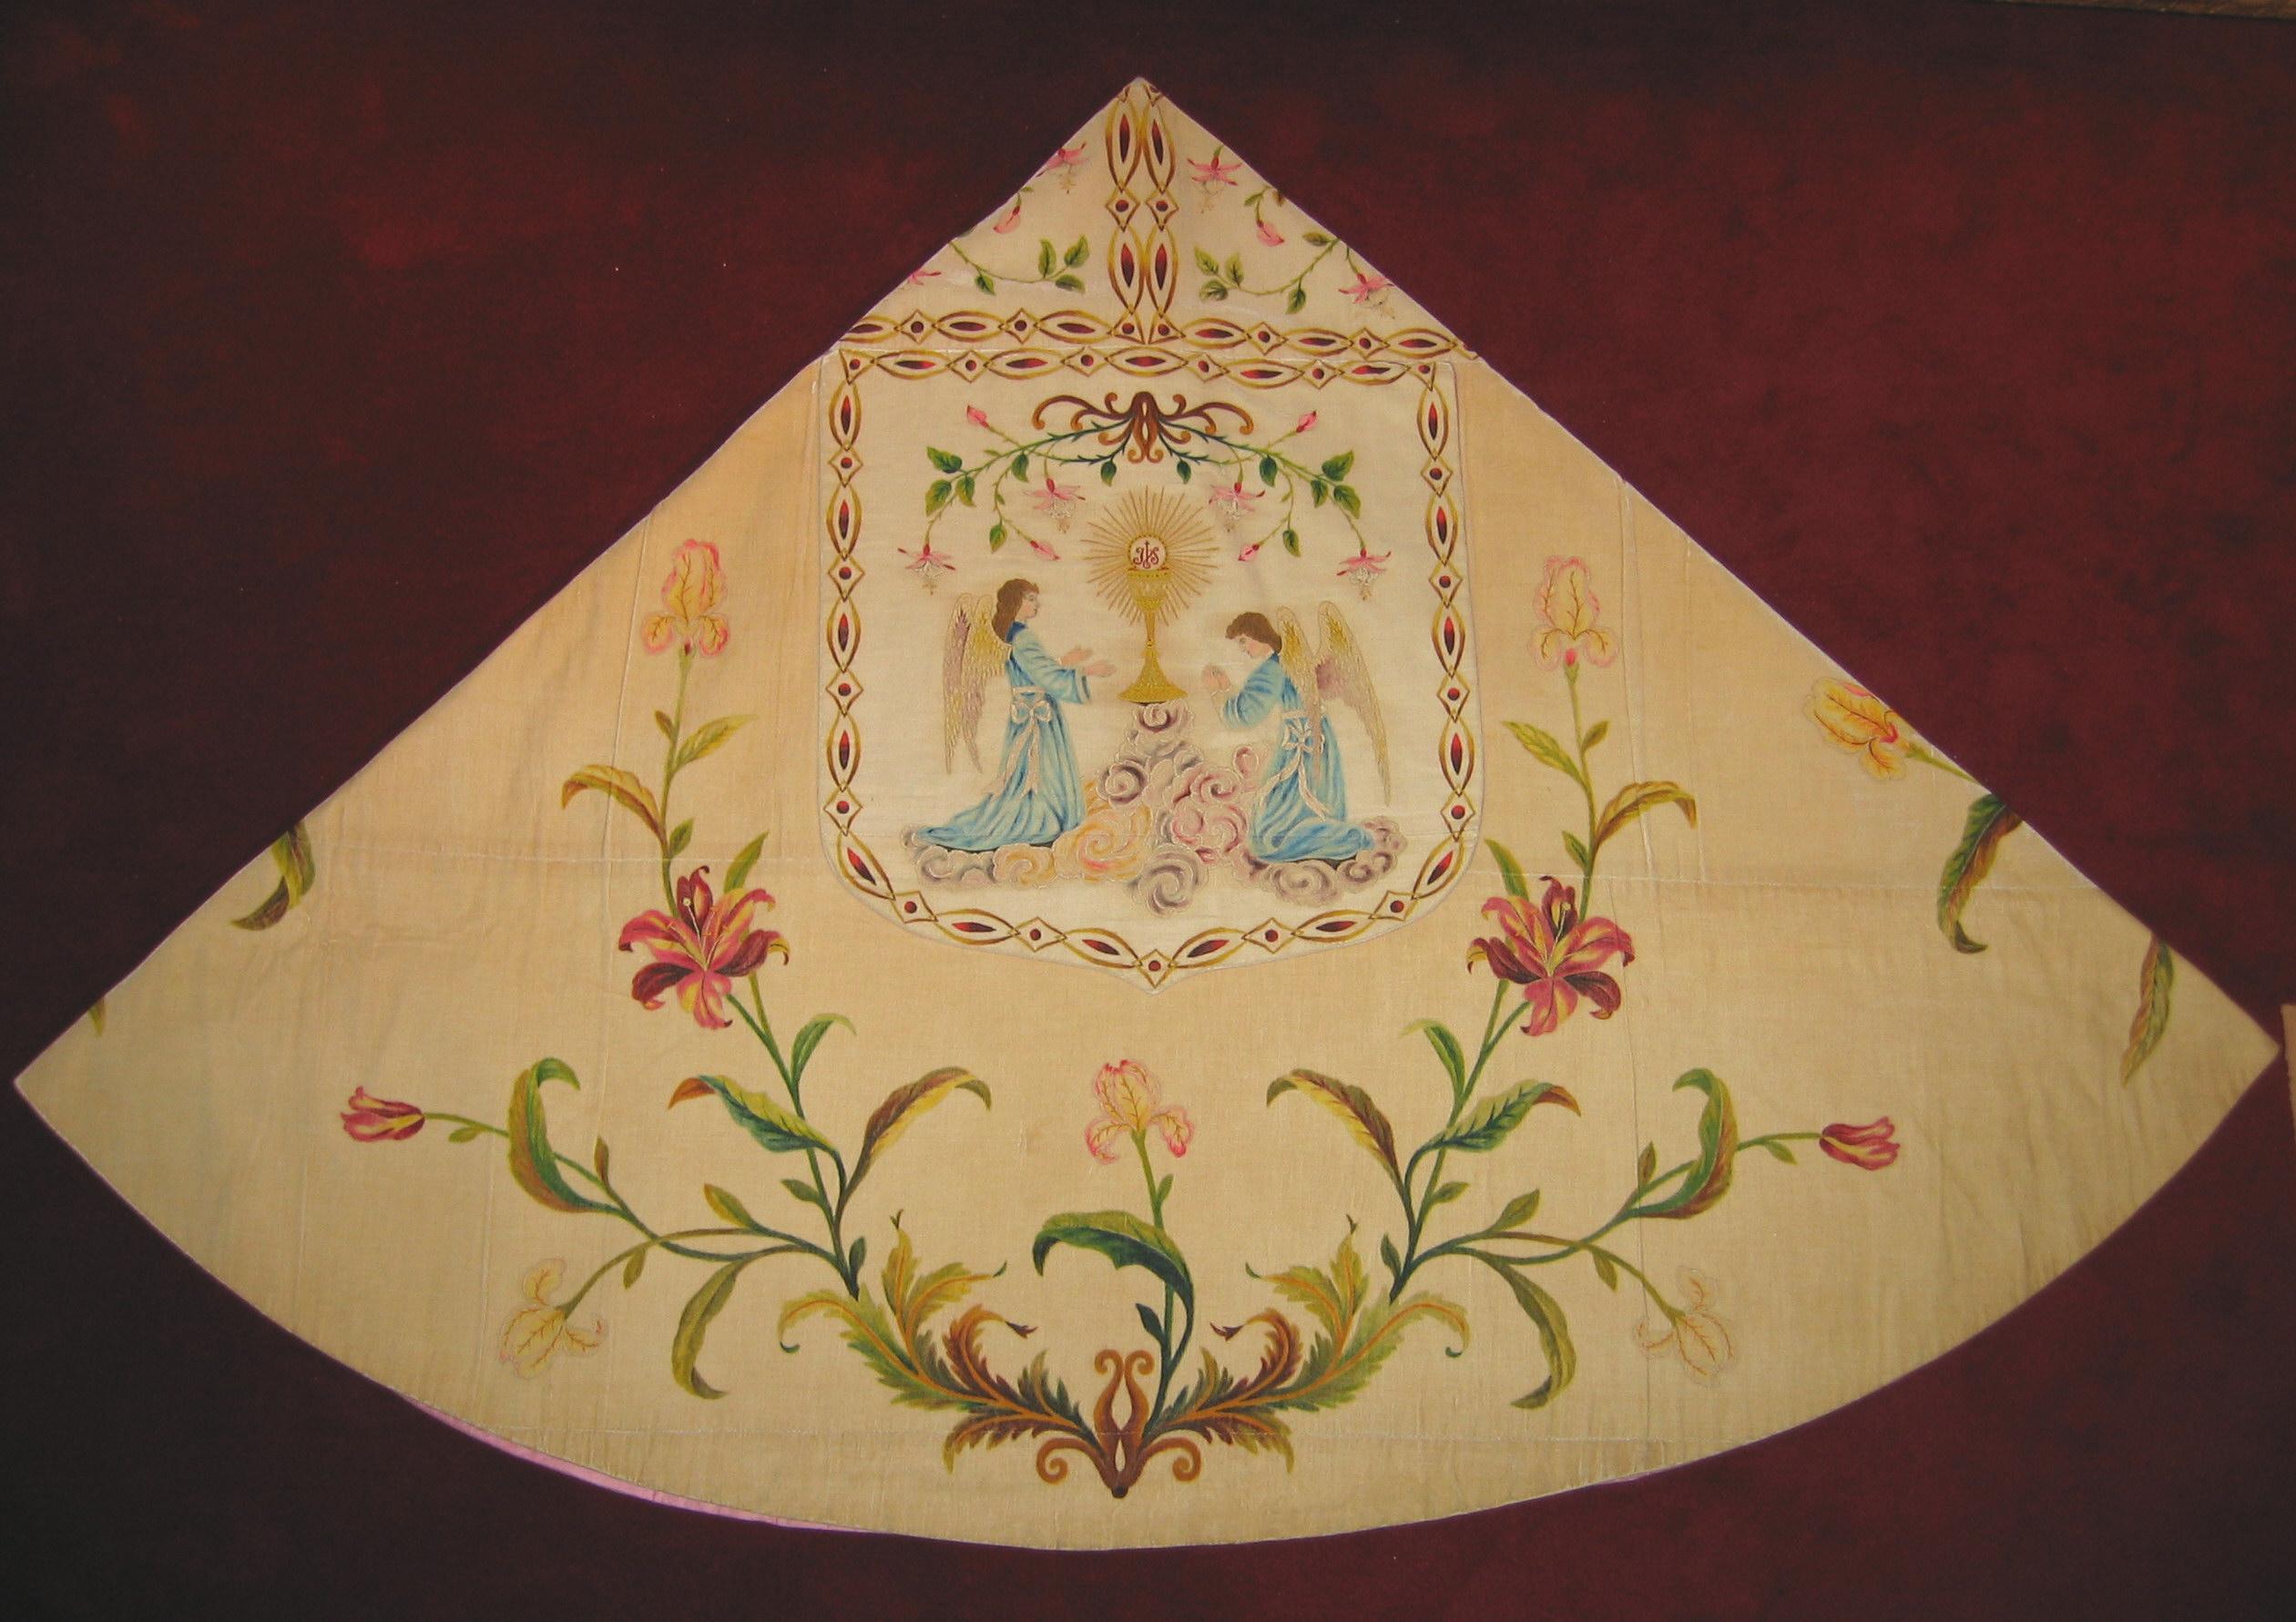 Capa pluvial de las MM Carmelitas Descalzas de Murguía